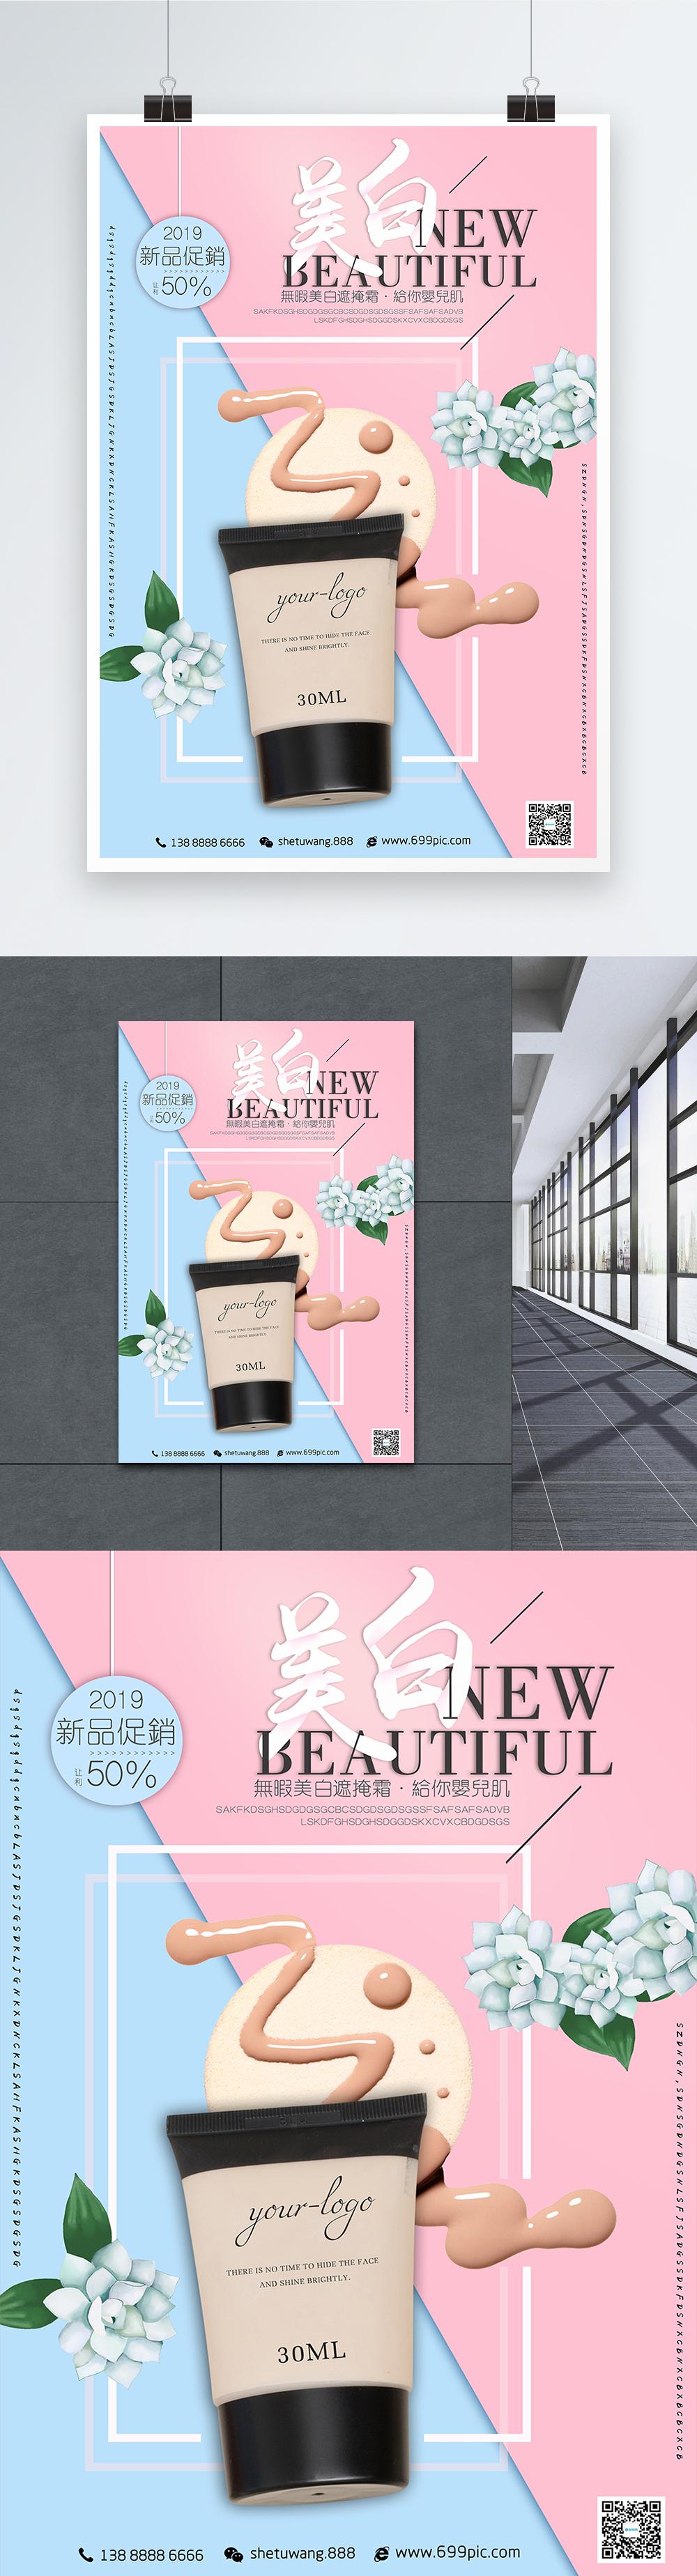 Poster Kosmetik Segar Sederhana Dan Kecil Gambar Unduh Gratis Templat 400831695 Format Gambar Psd Lovepik Com